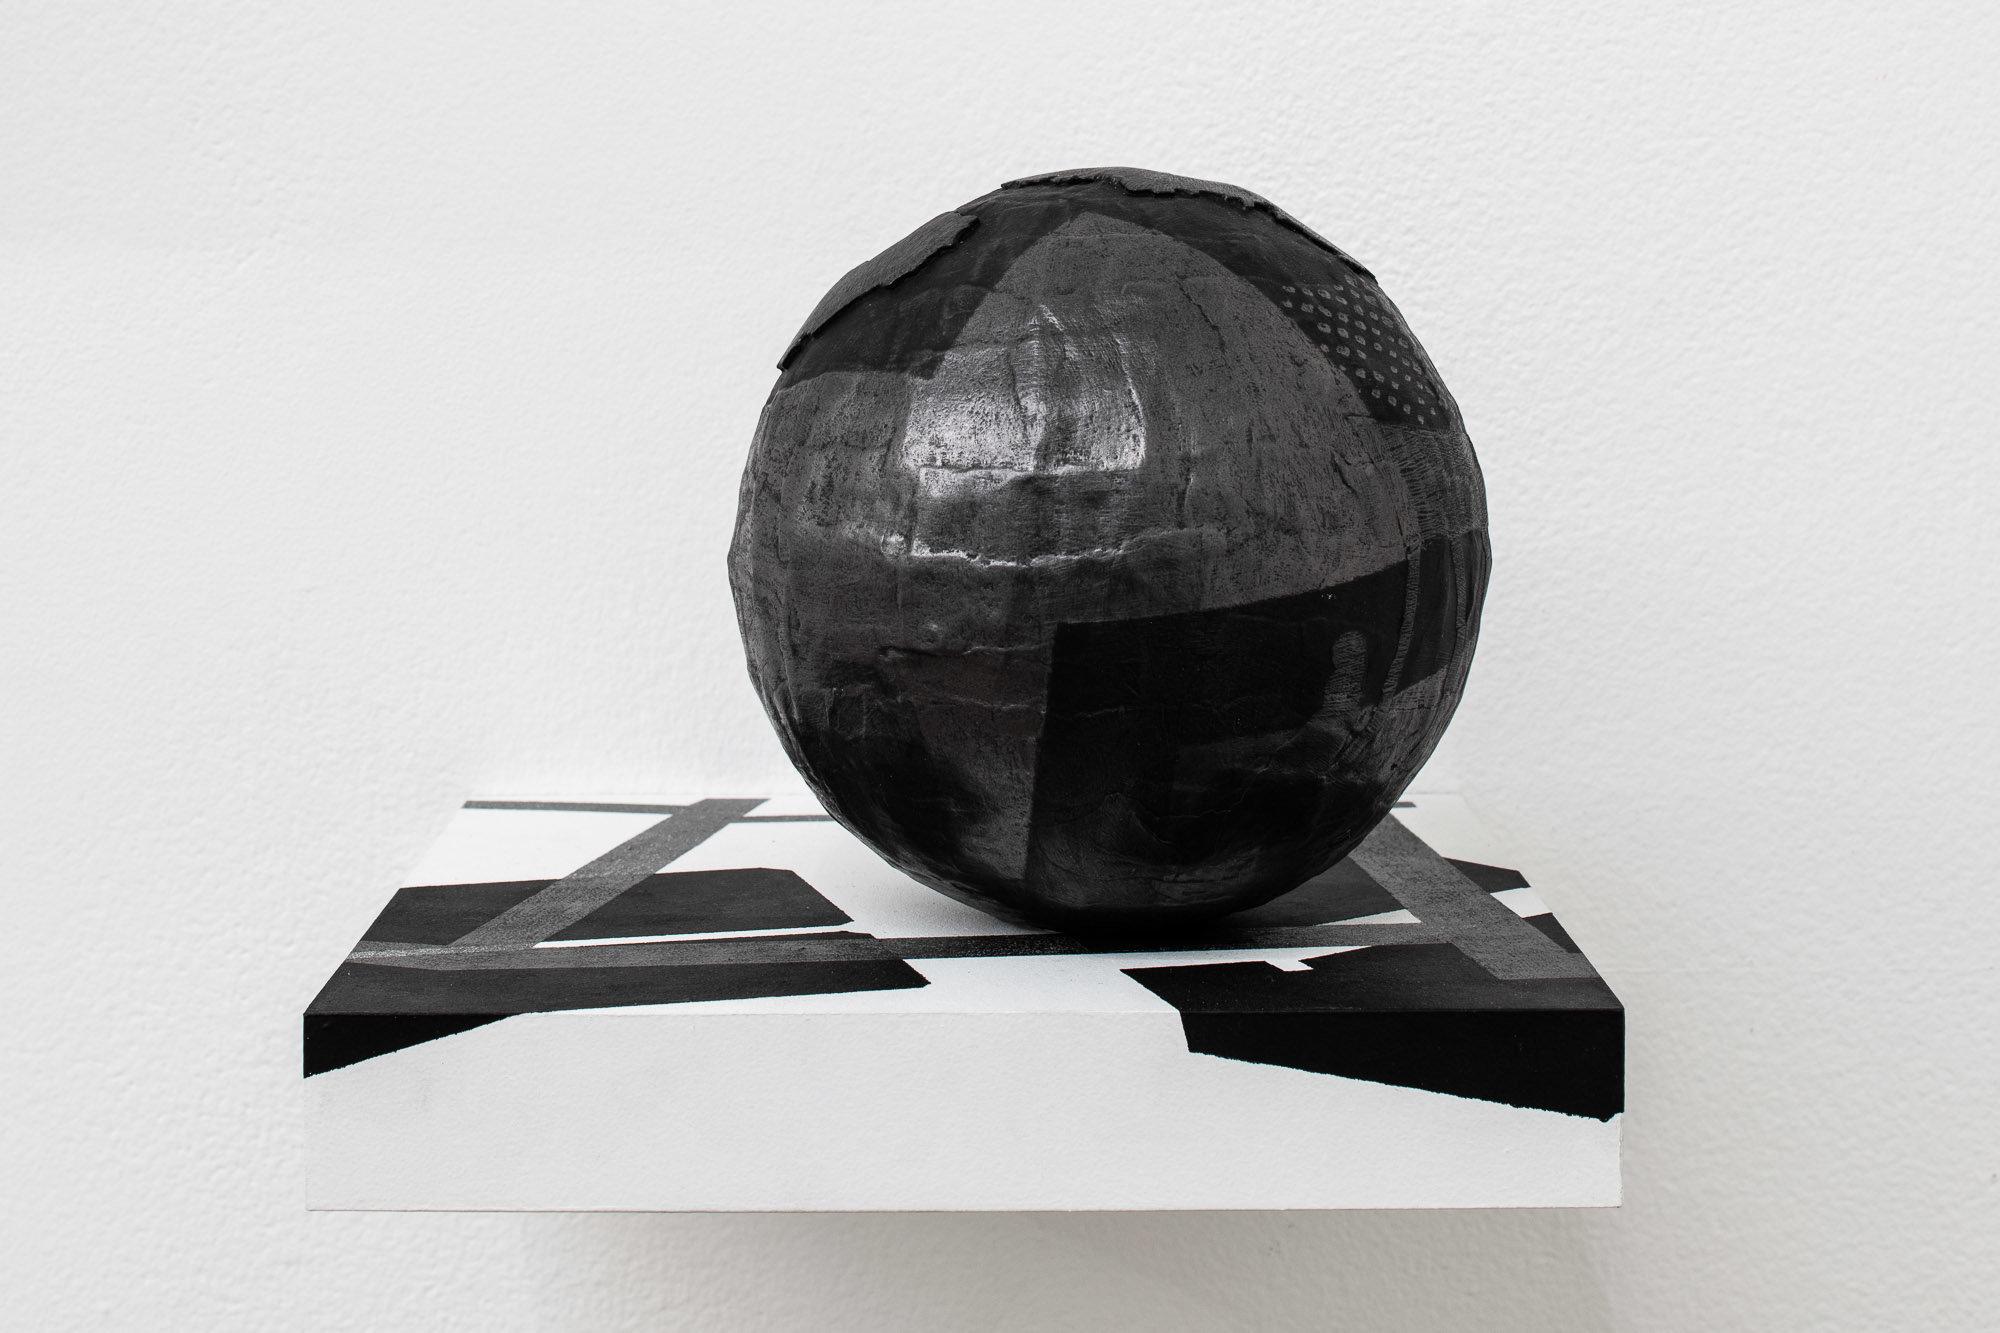 Residual #14 Pocket Globe